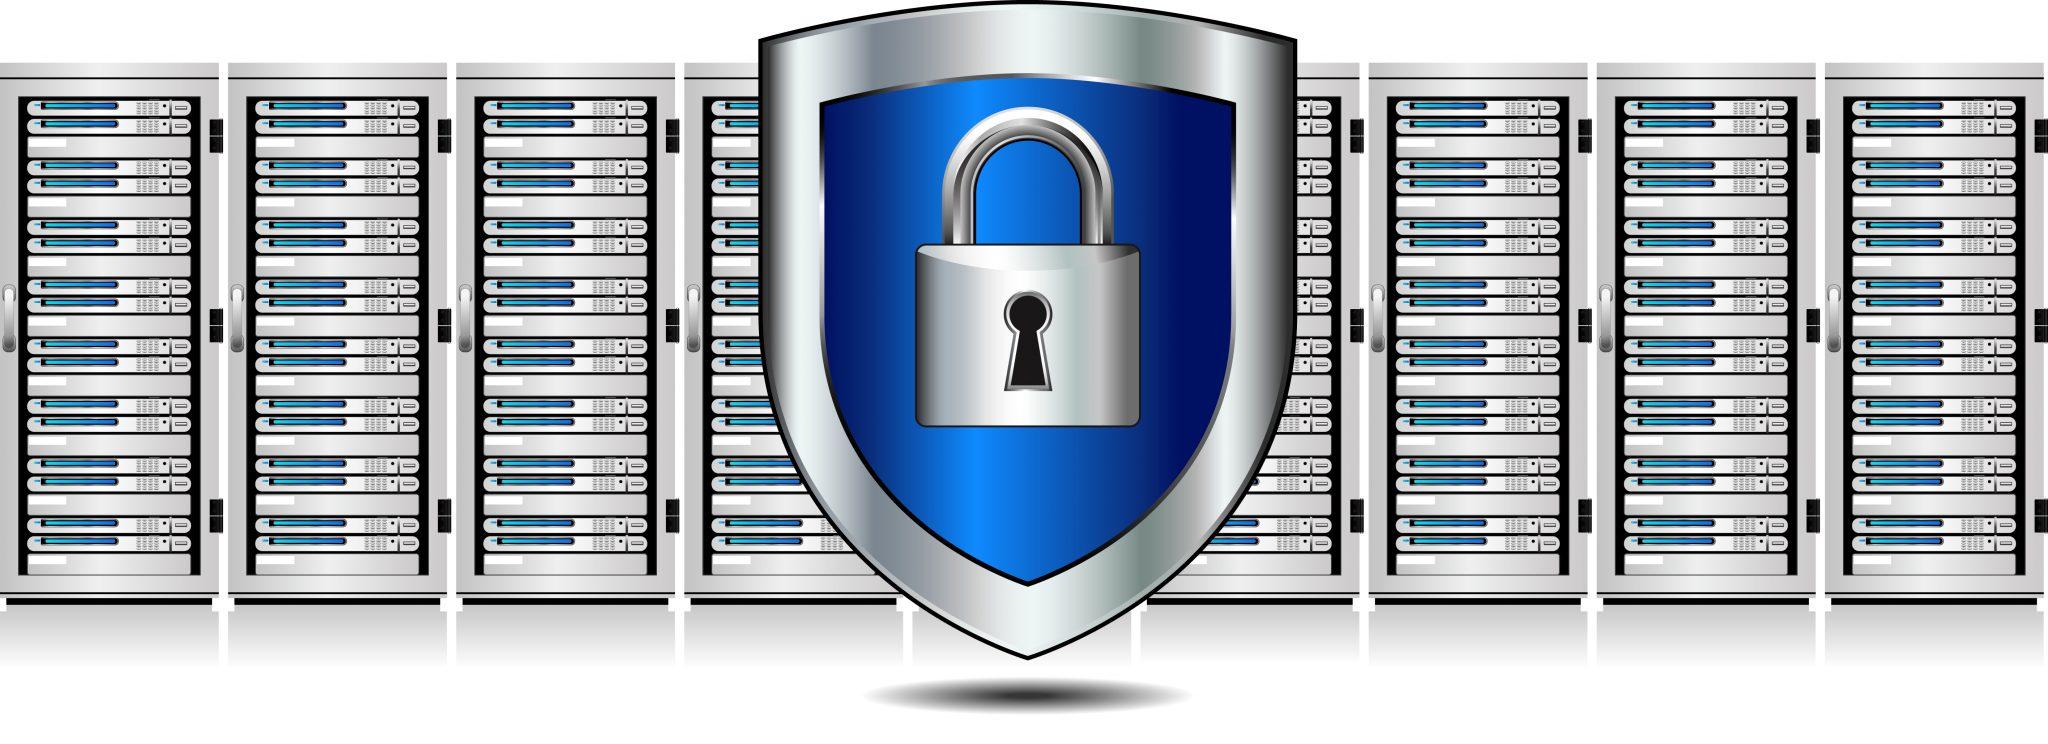 Web Checklist Security Application